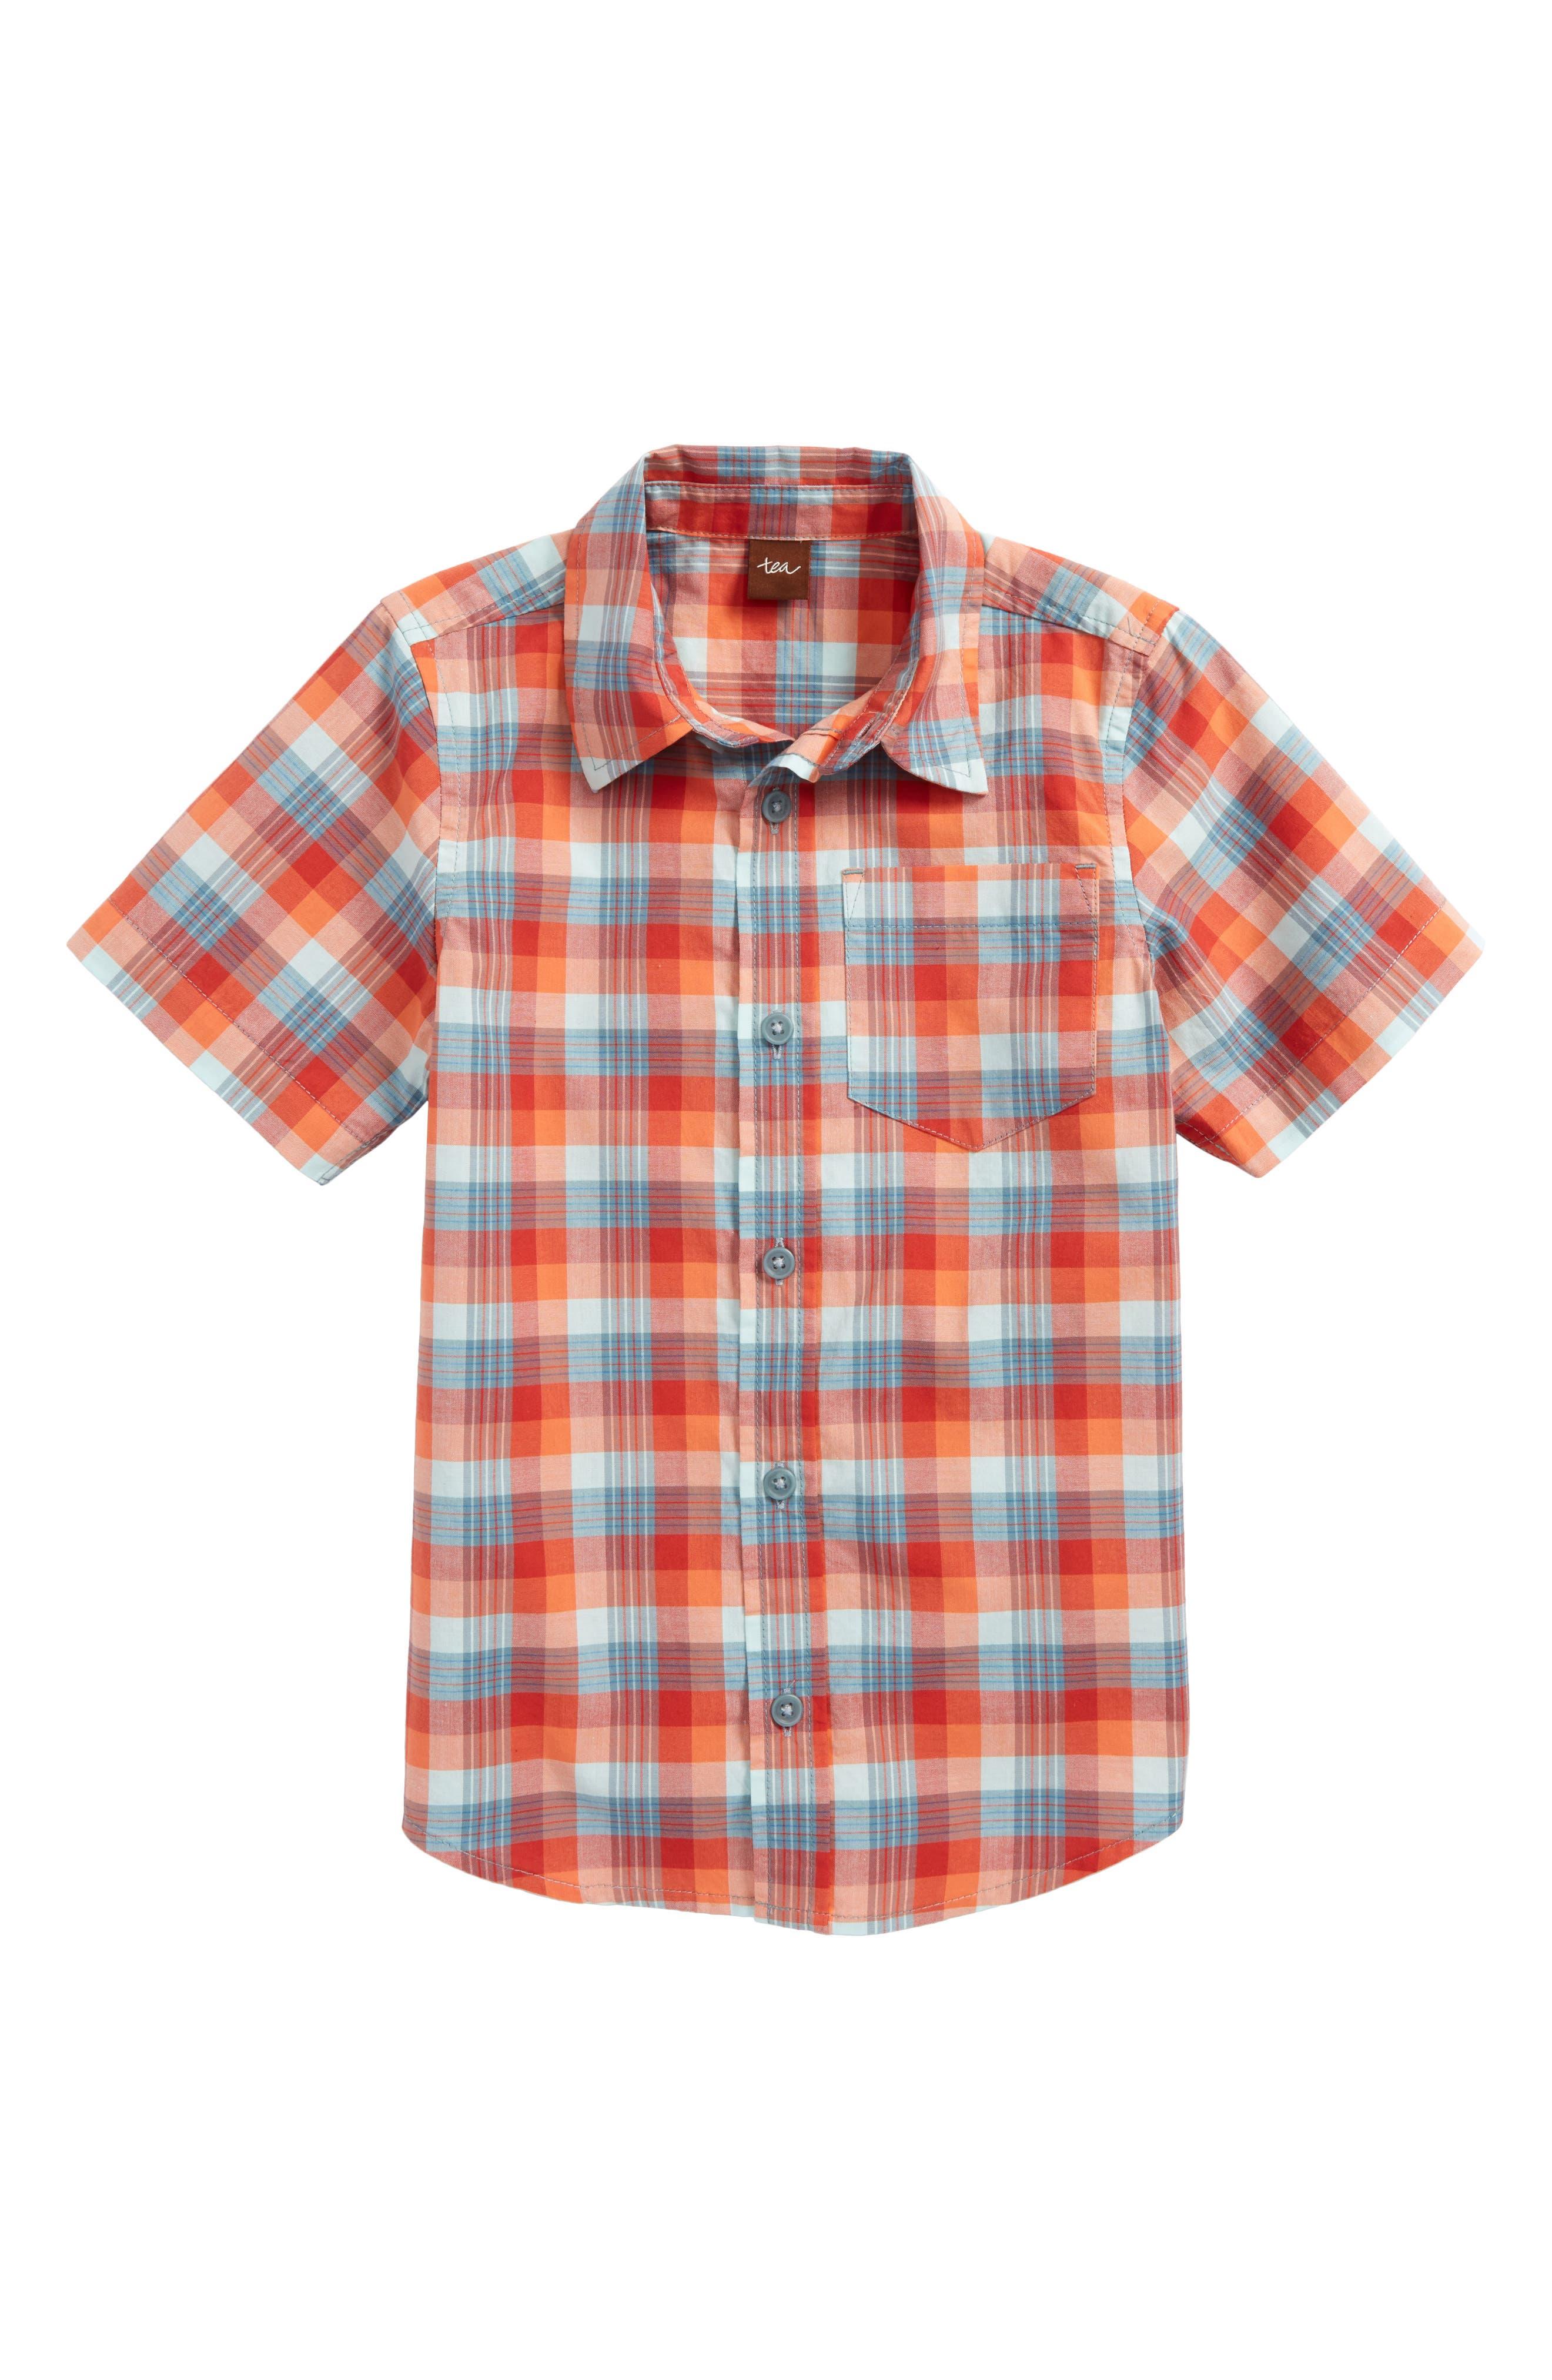 Tea Collection Plaid Short Sleeve Shirt (Toddler Boys & Little Boys)